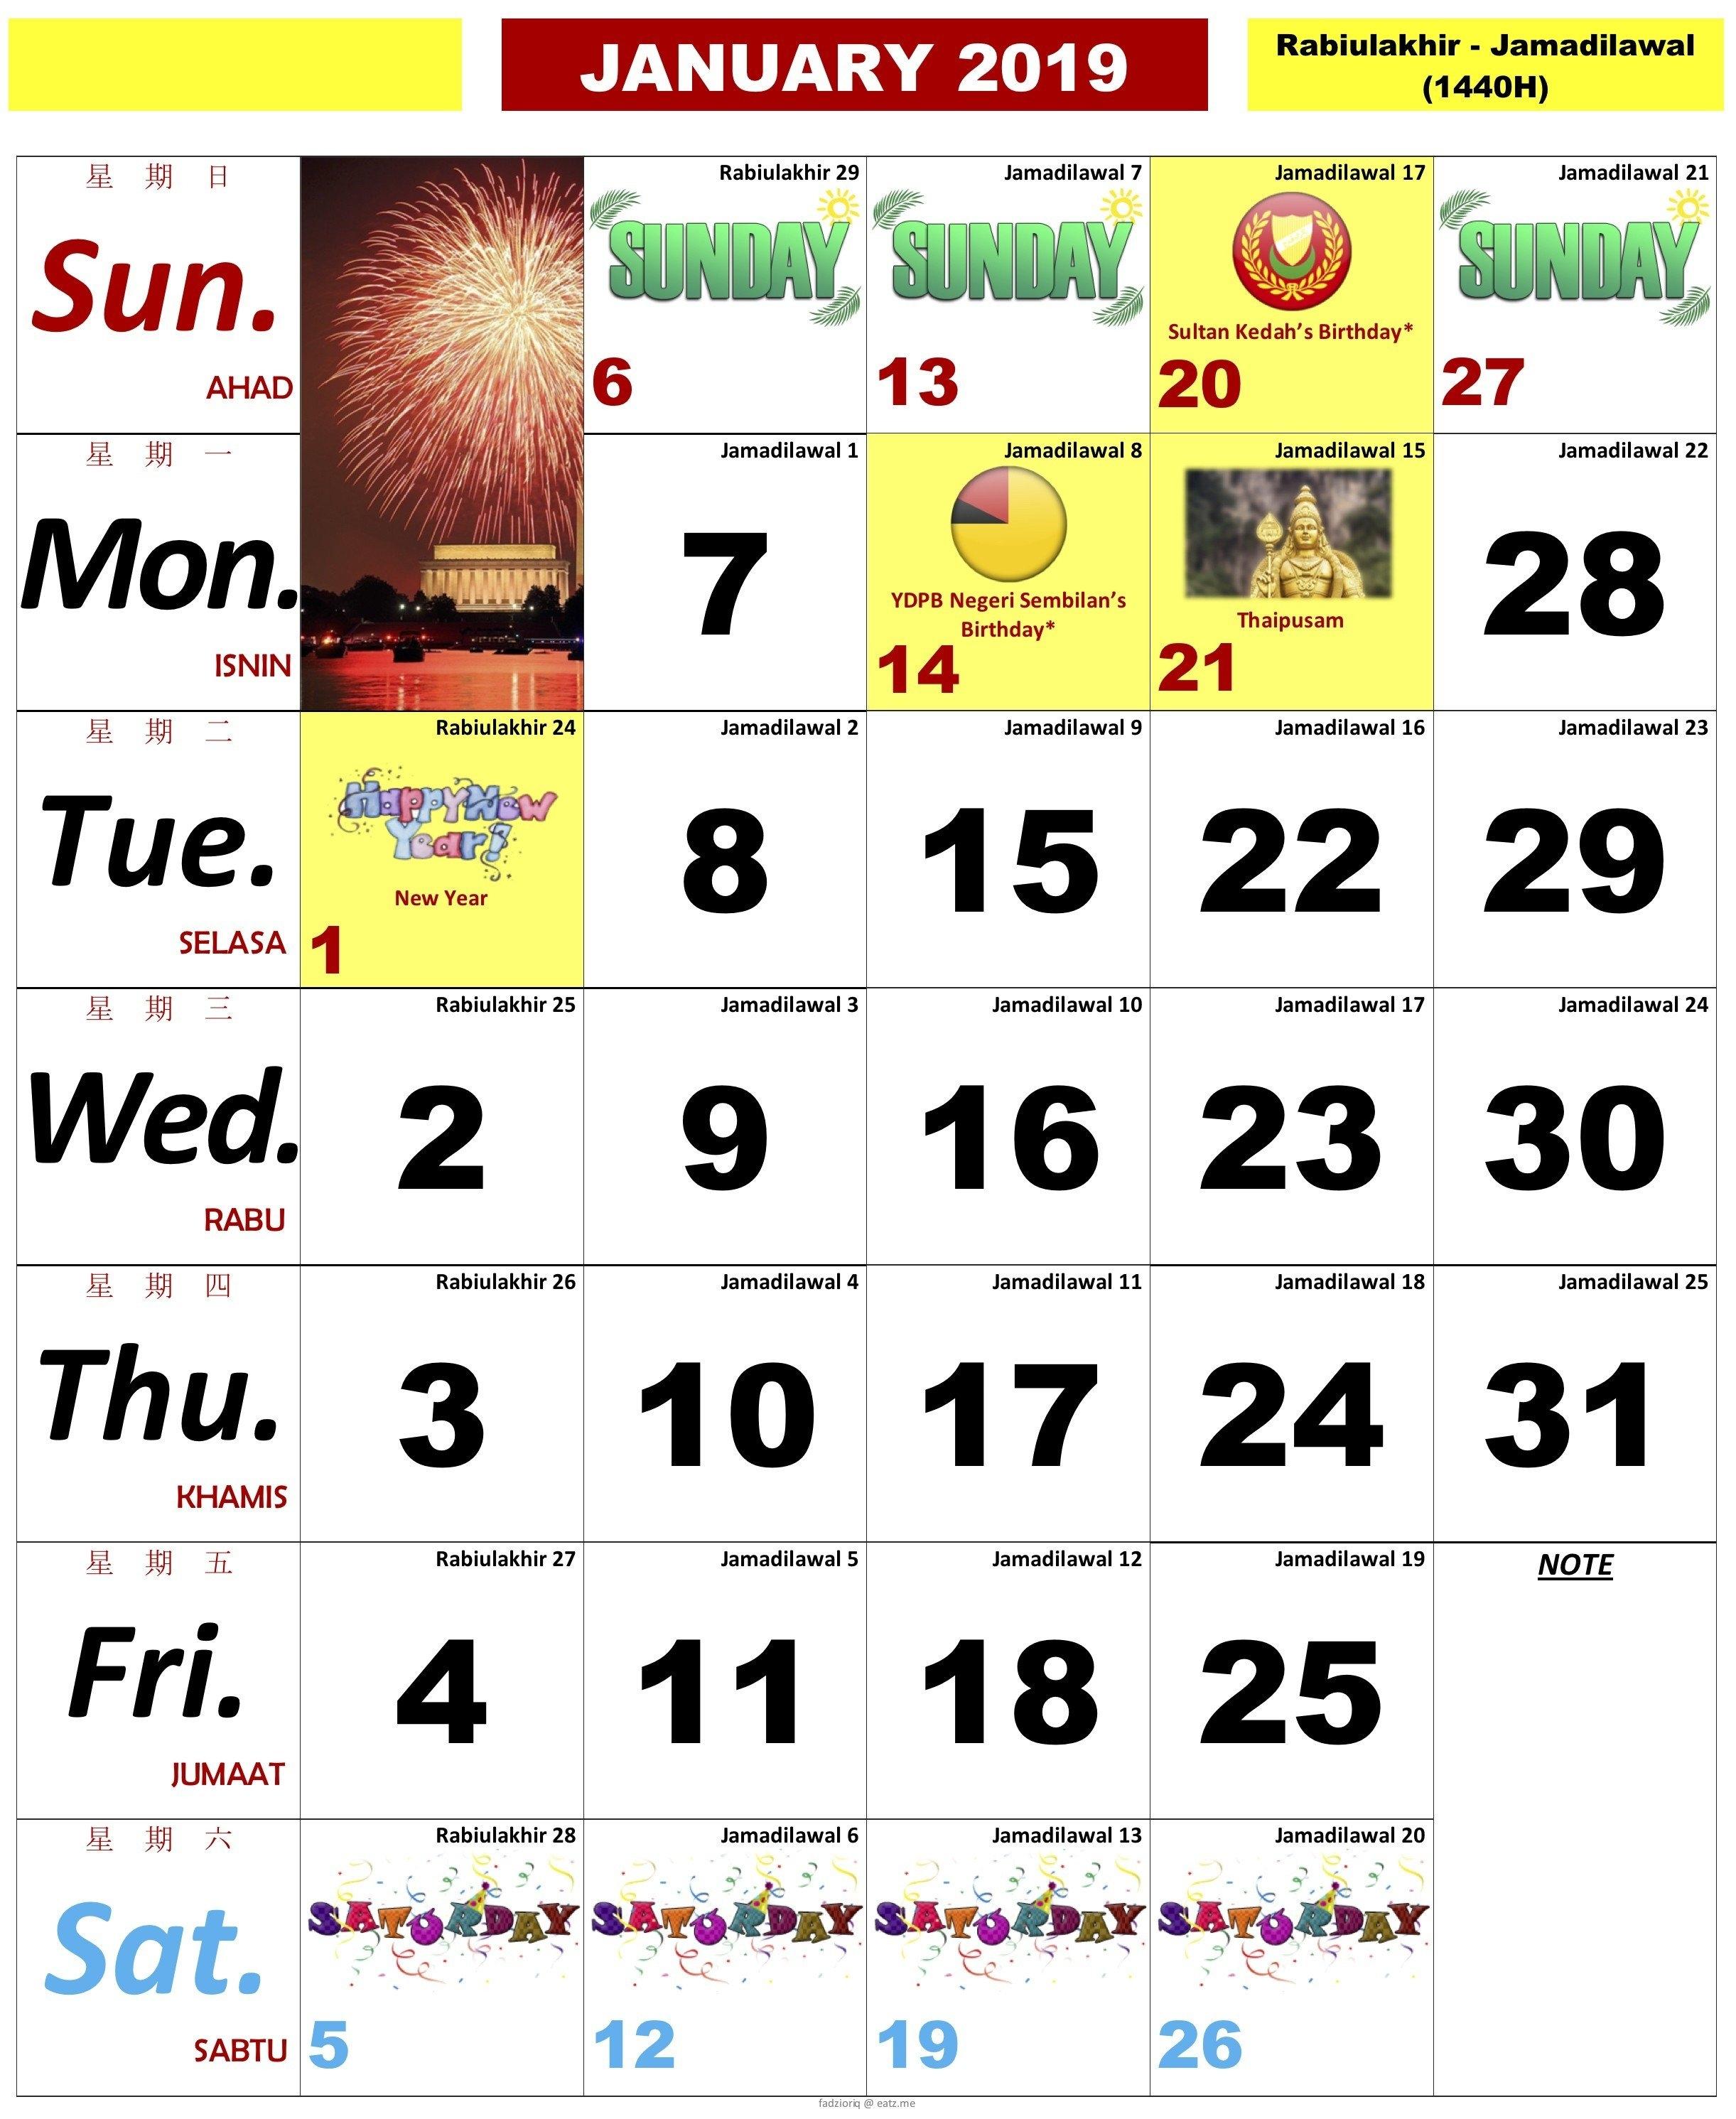 Information Regarding Kalendar Kuda 2019 Malaysia Pdf – Calendar Calendar 2019 Kuda Pdf